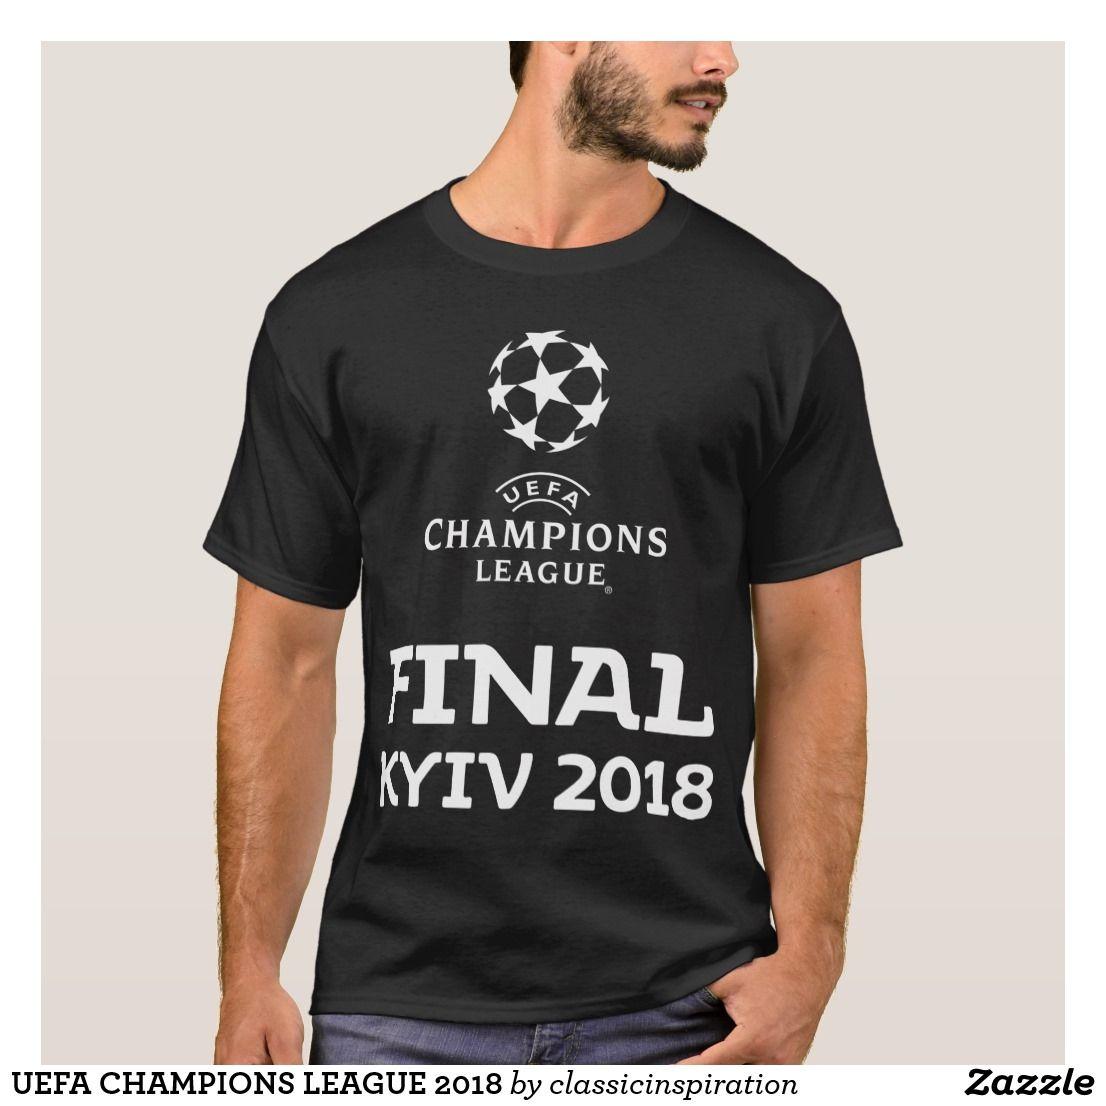 UEFA CHAMPIONS LEAGUE 2018 T-Shirt